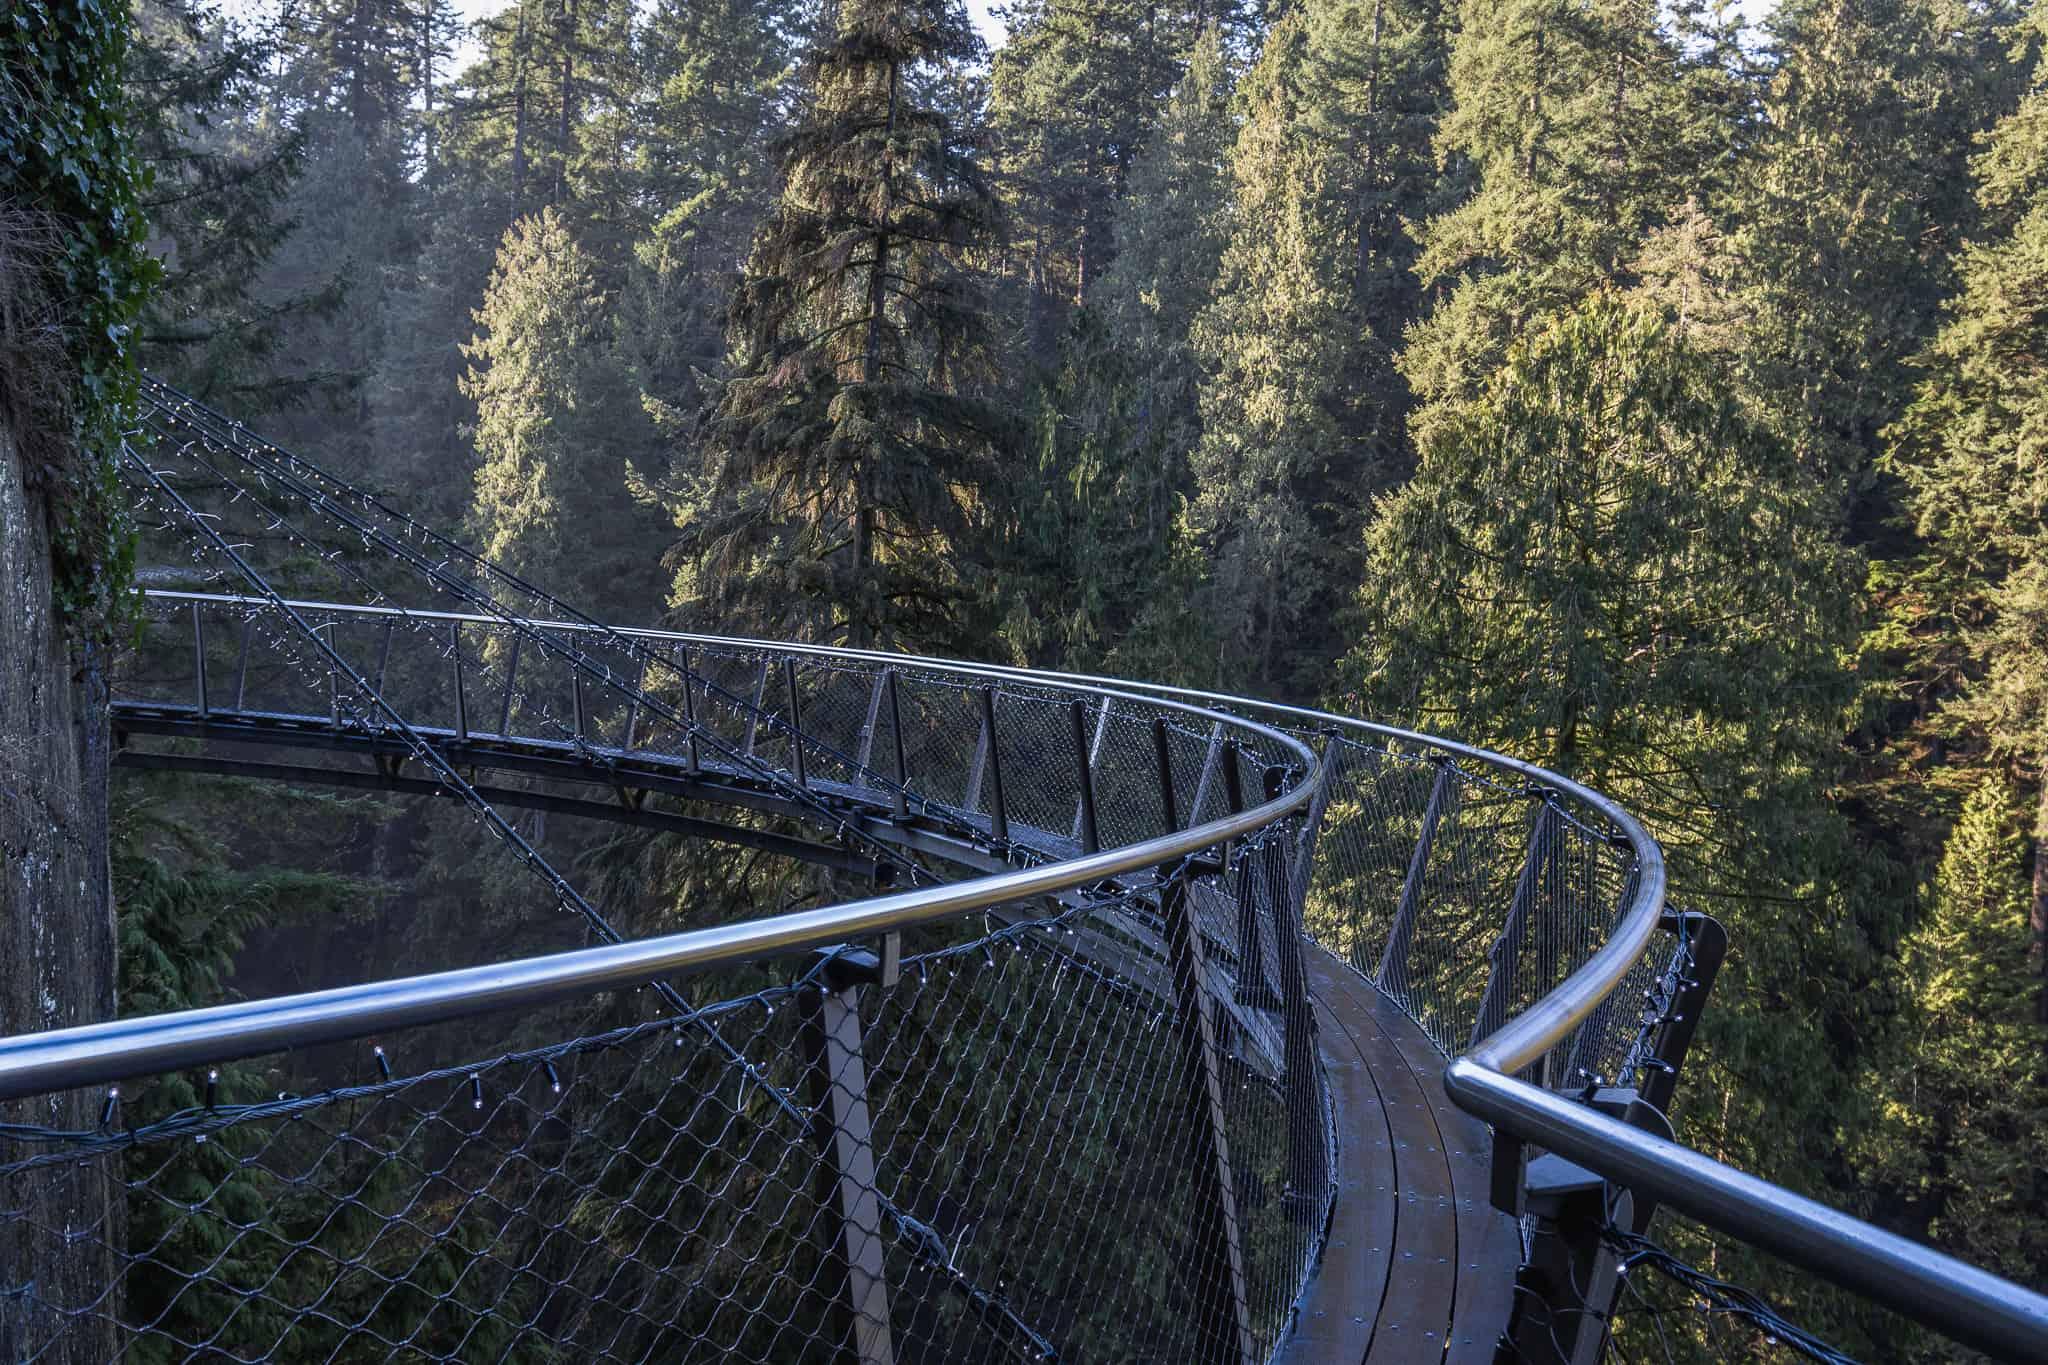 Cliffwalk at Capilano Suspension Park Vancouver